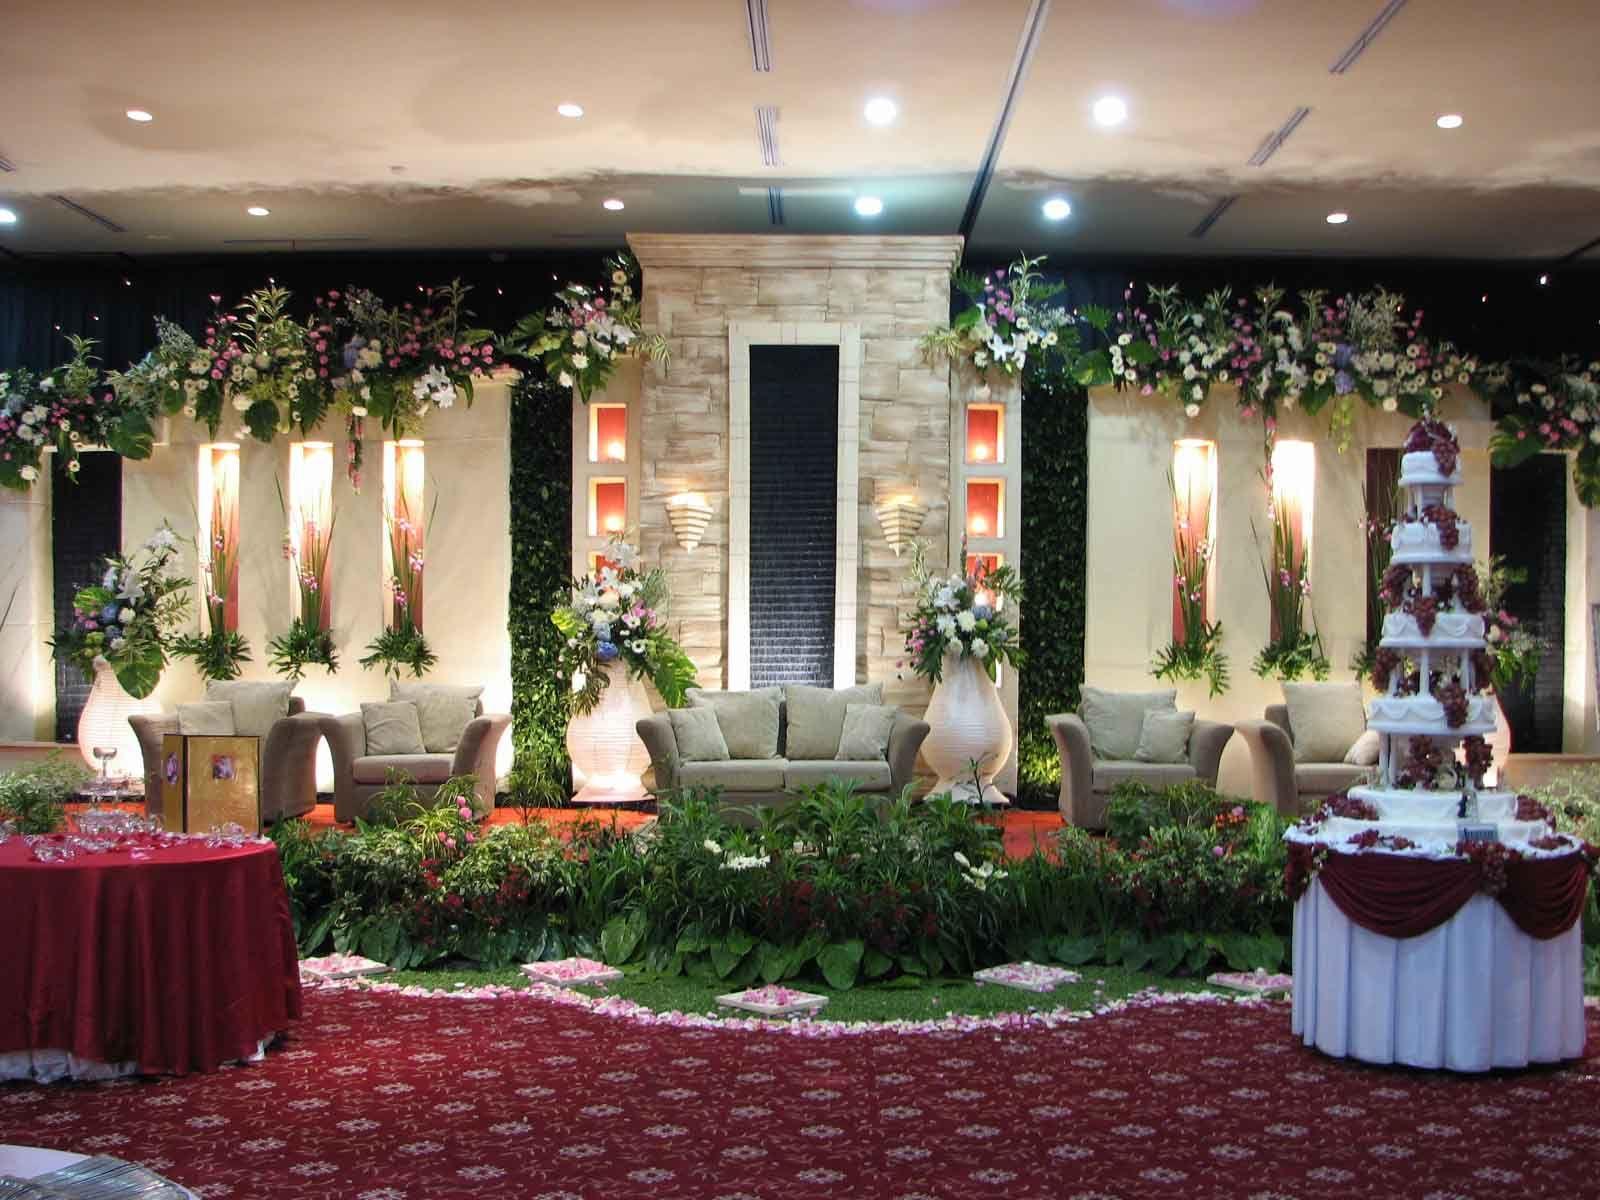 Ide untuk dekorasi pelaminan wedding pinterest wedding stage ide untuk dekorasi pelaminan junglespirit Gallery